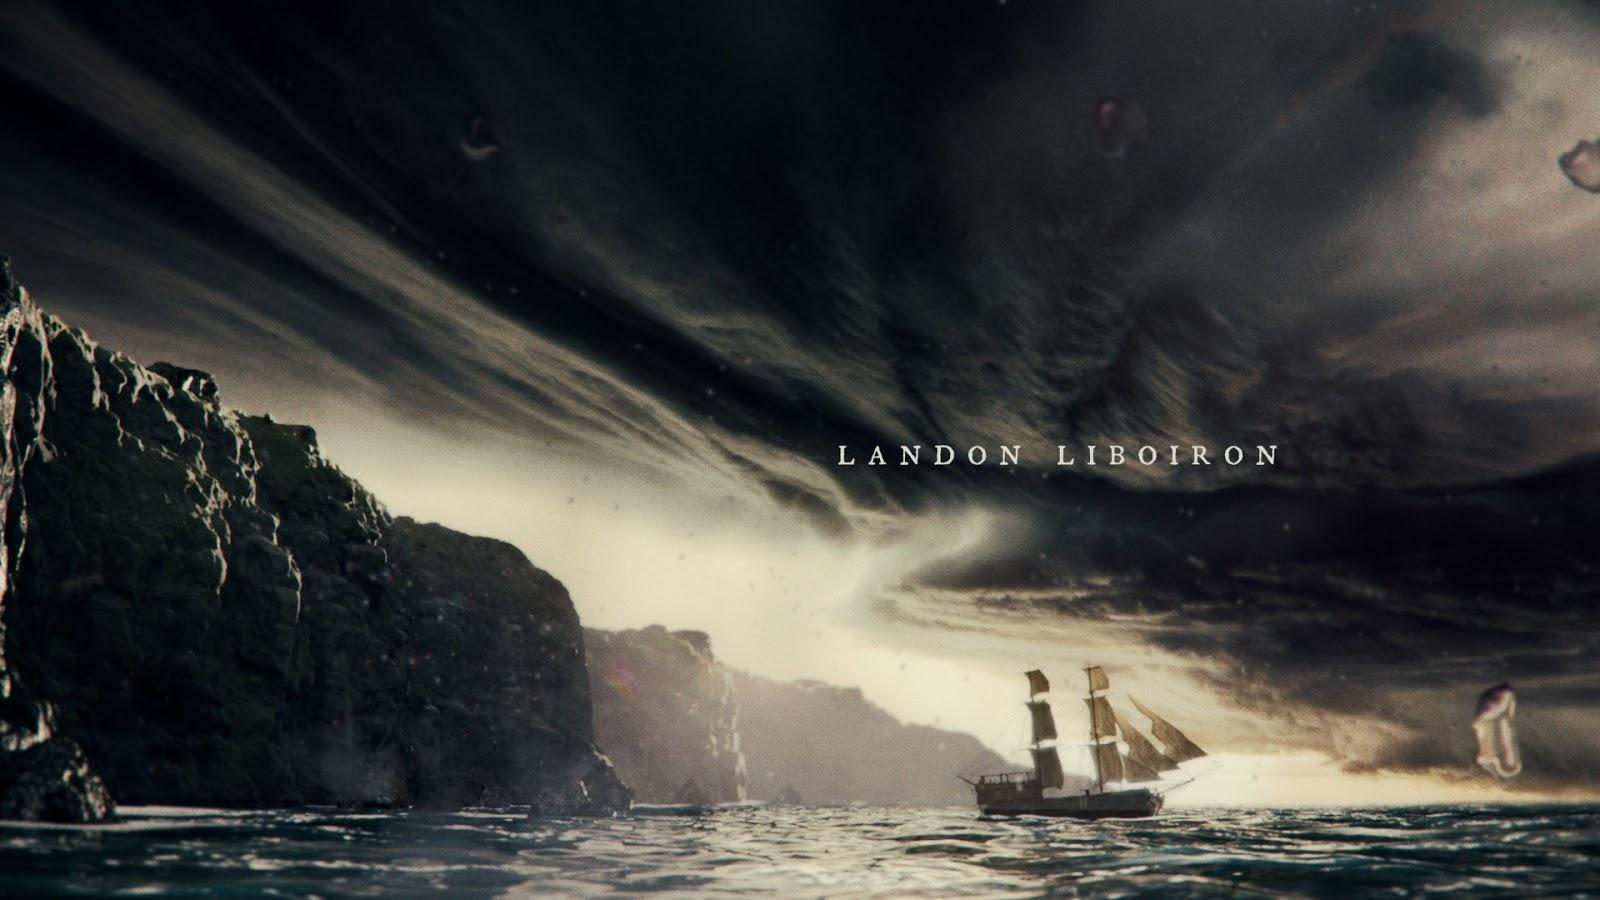 Iamstatic - Landon